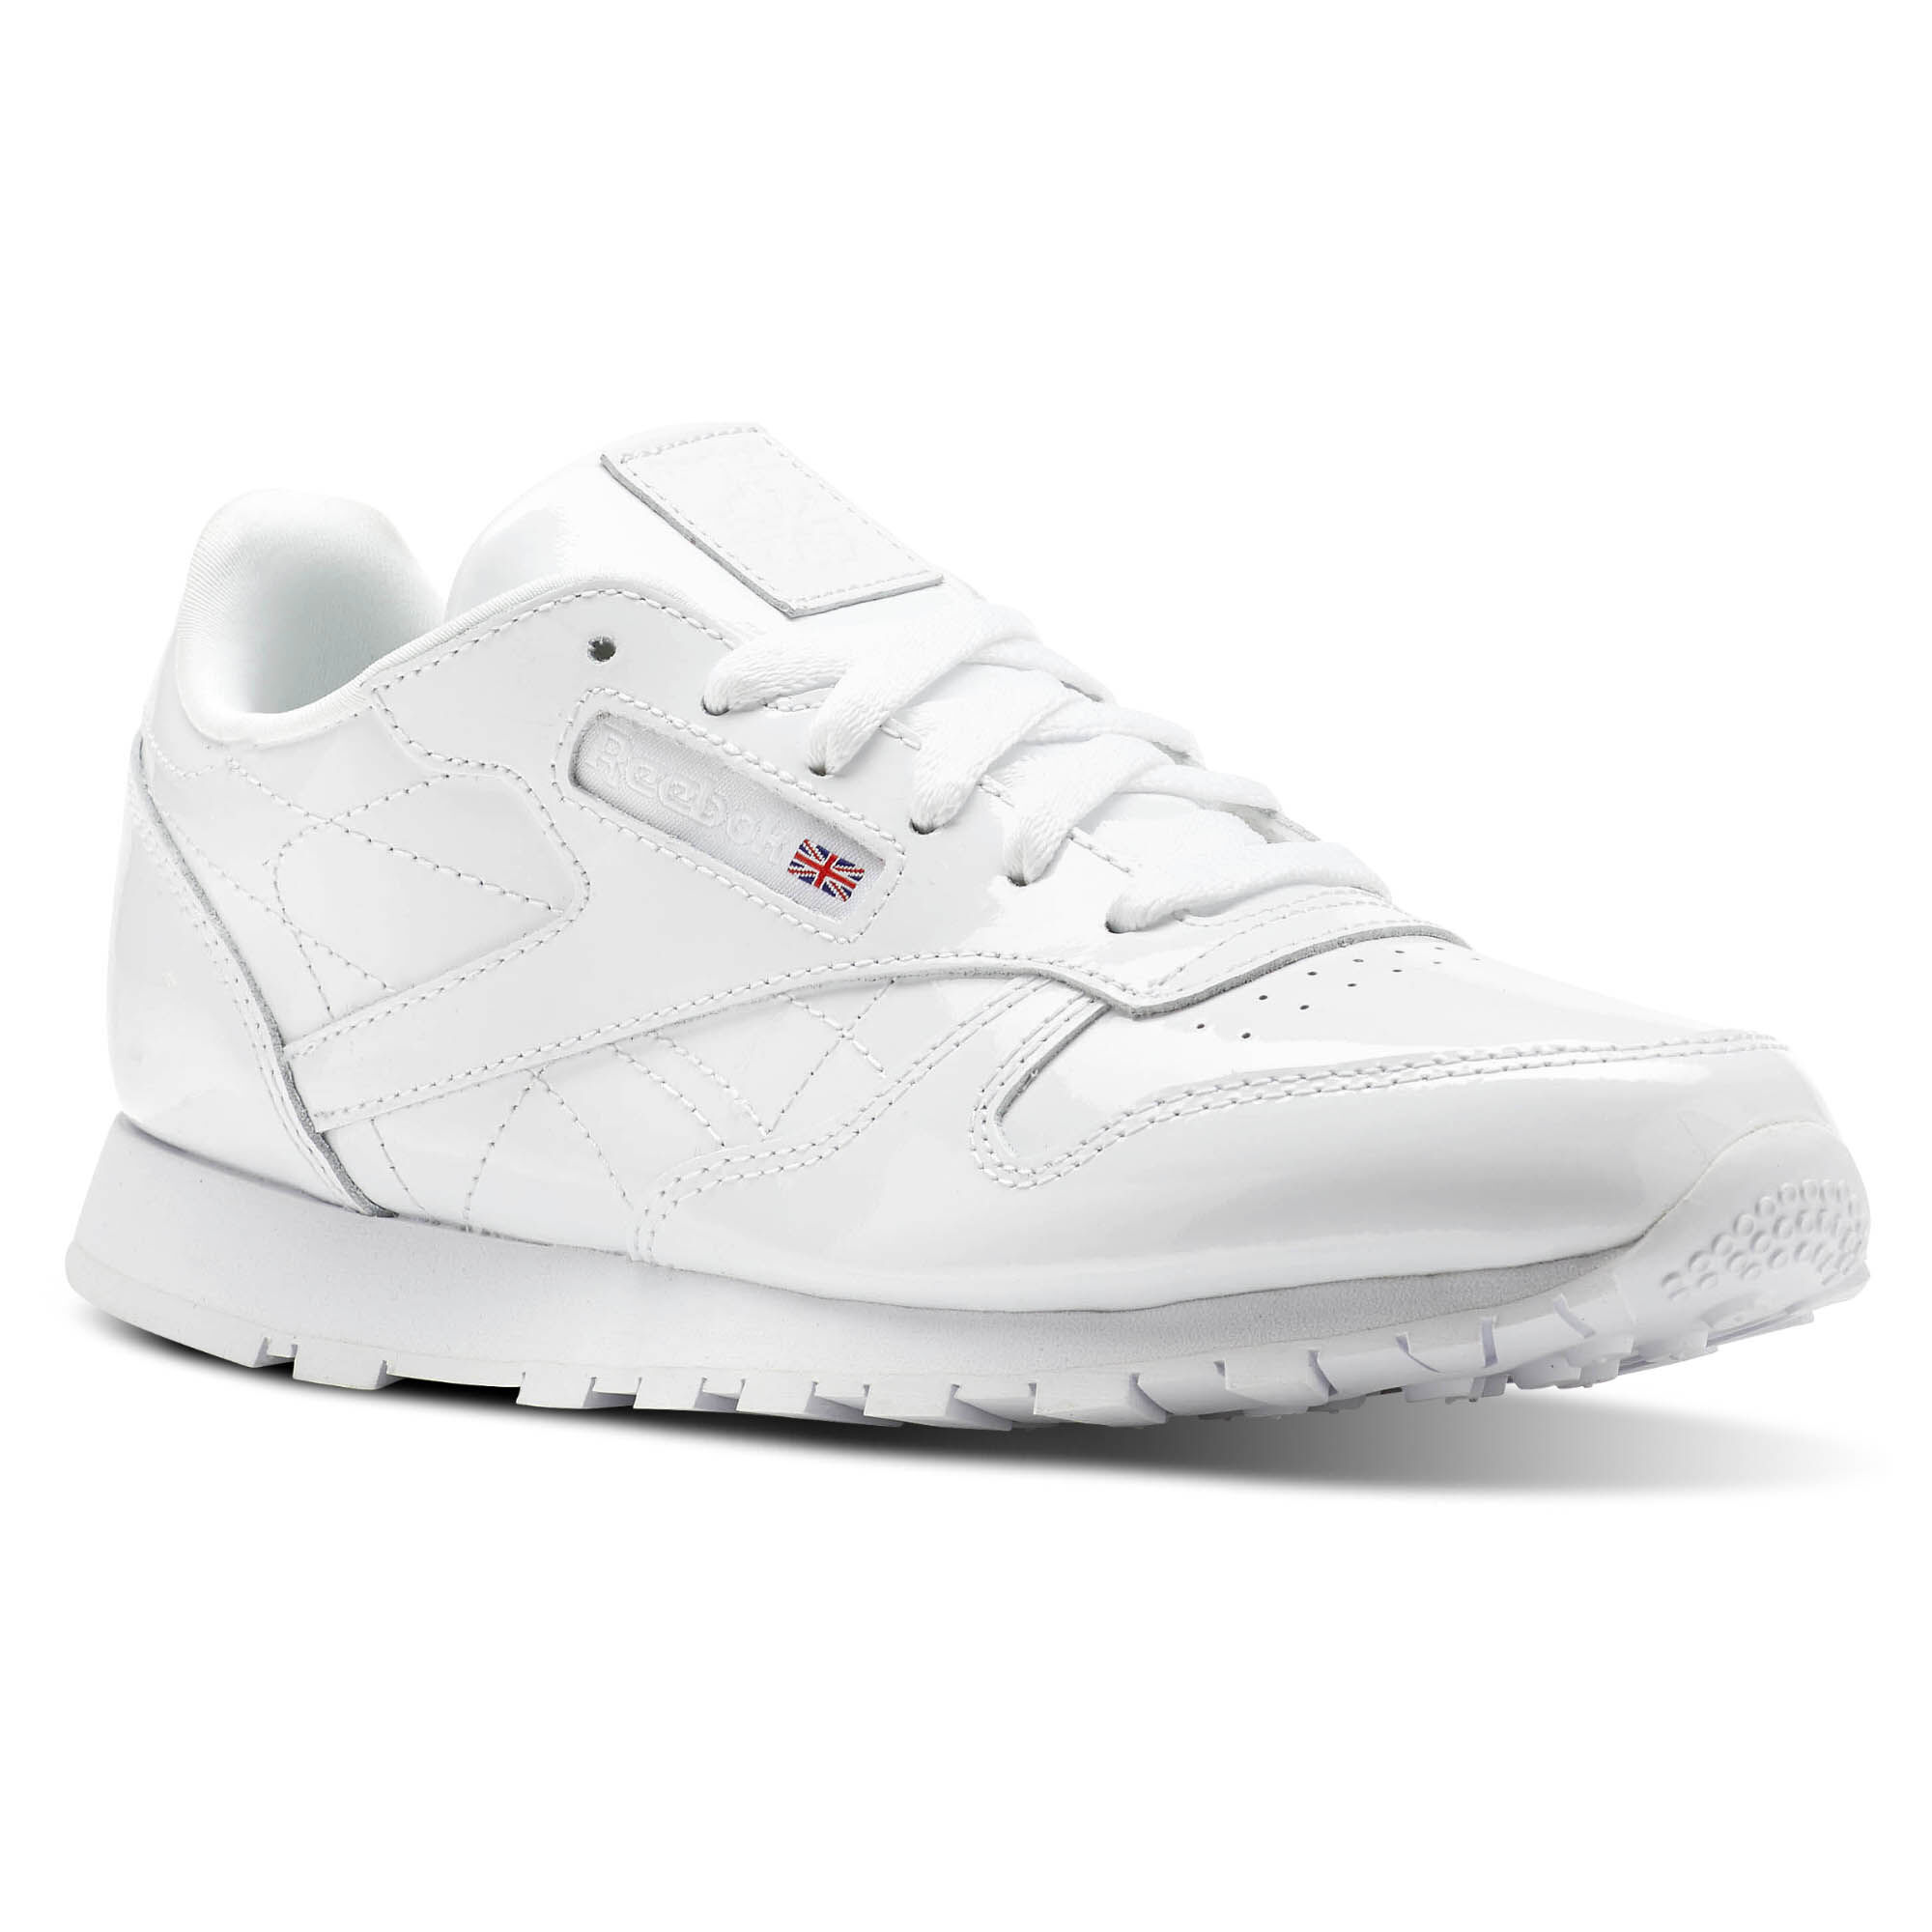 Reebok Sport Chaussures CL LEATHER LS Reebok Sport soldes Yl2ogzWMh1